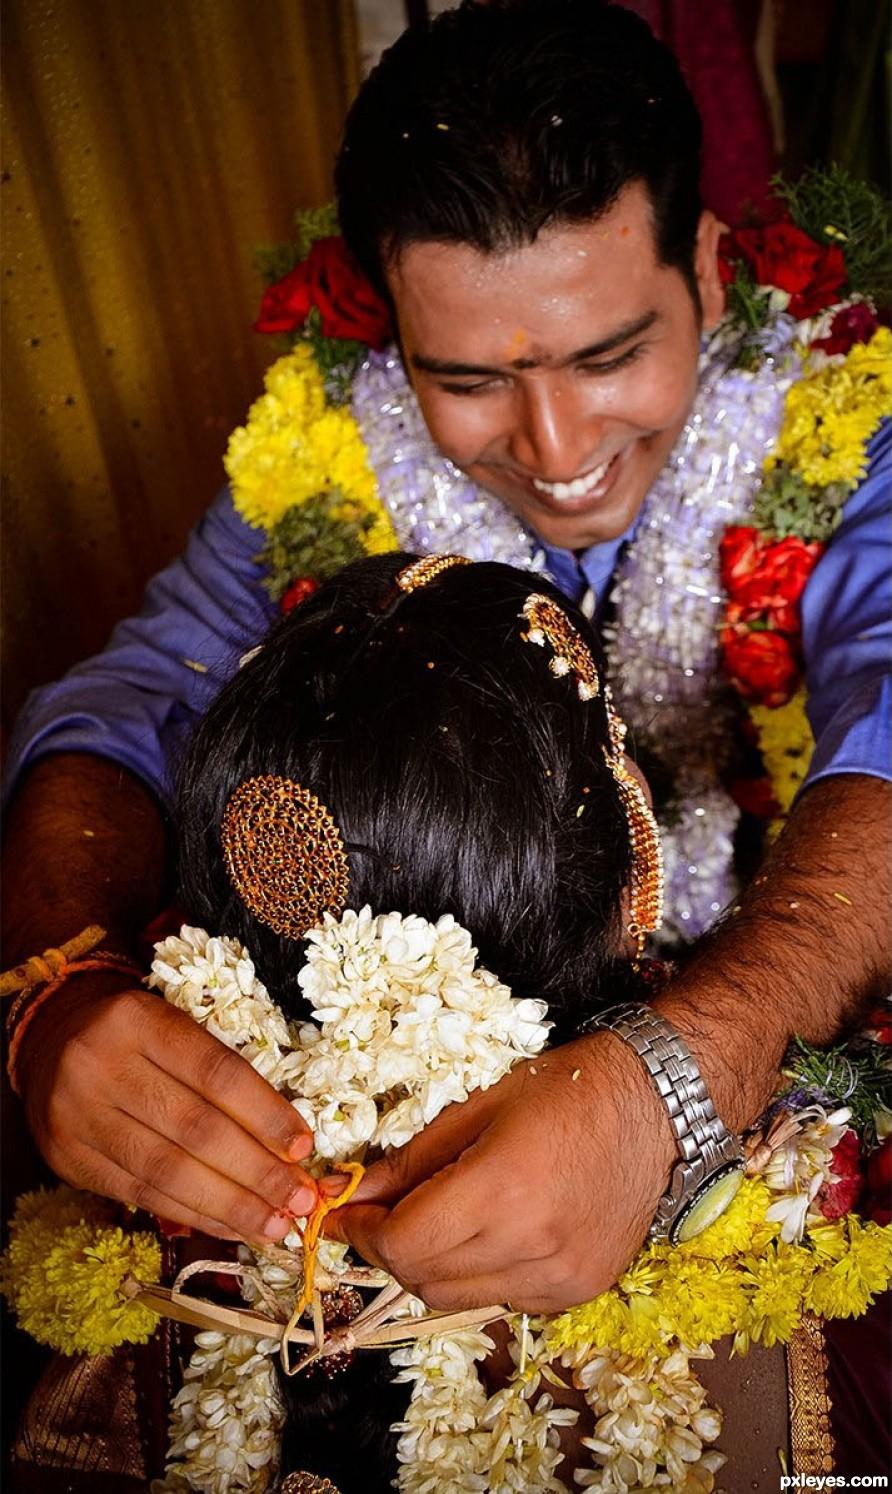 wedding(Youre my dream, my love, my life)